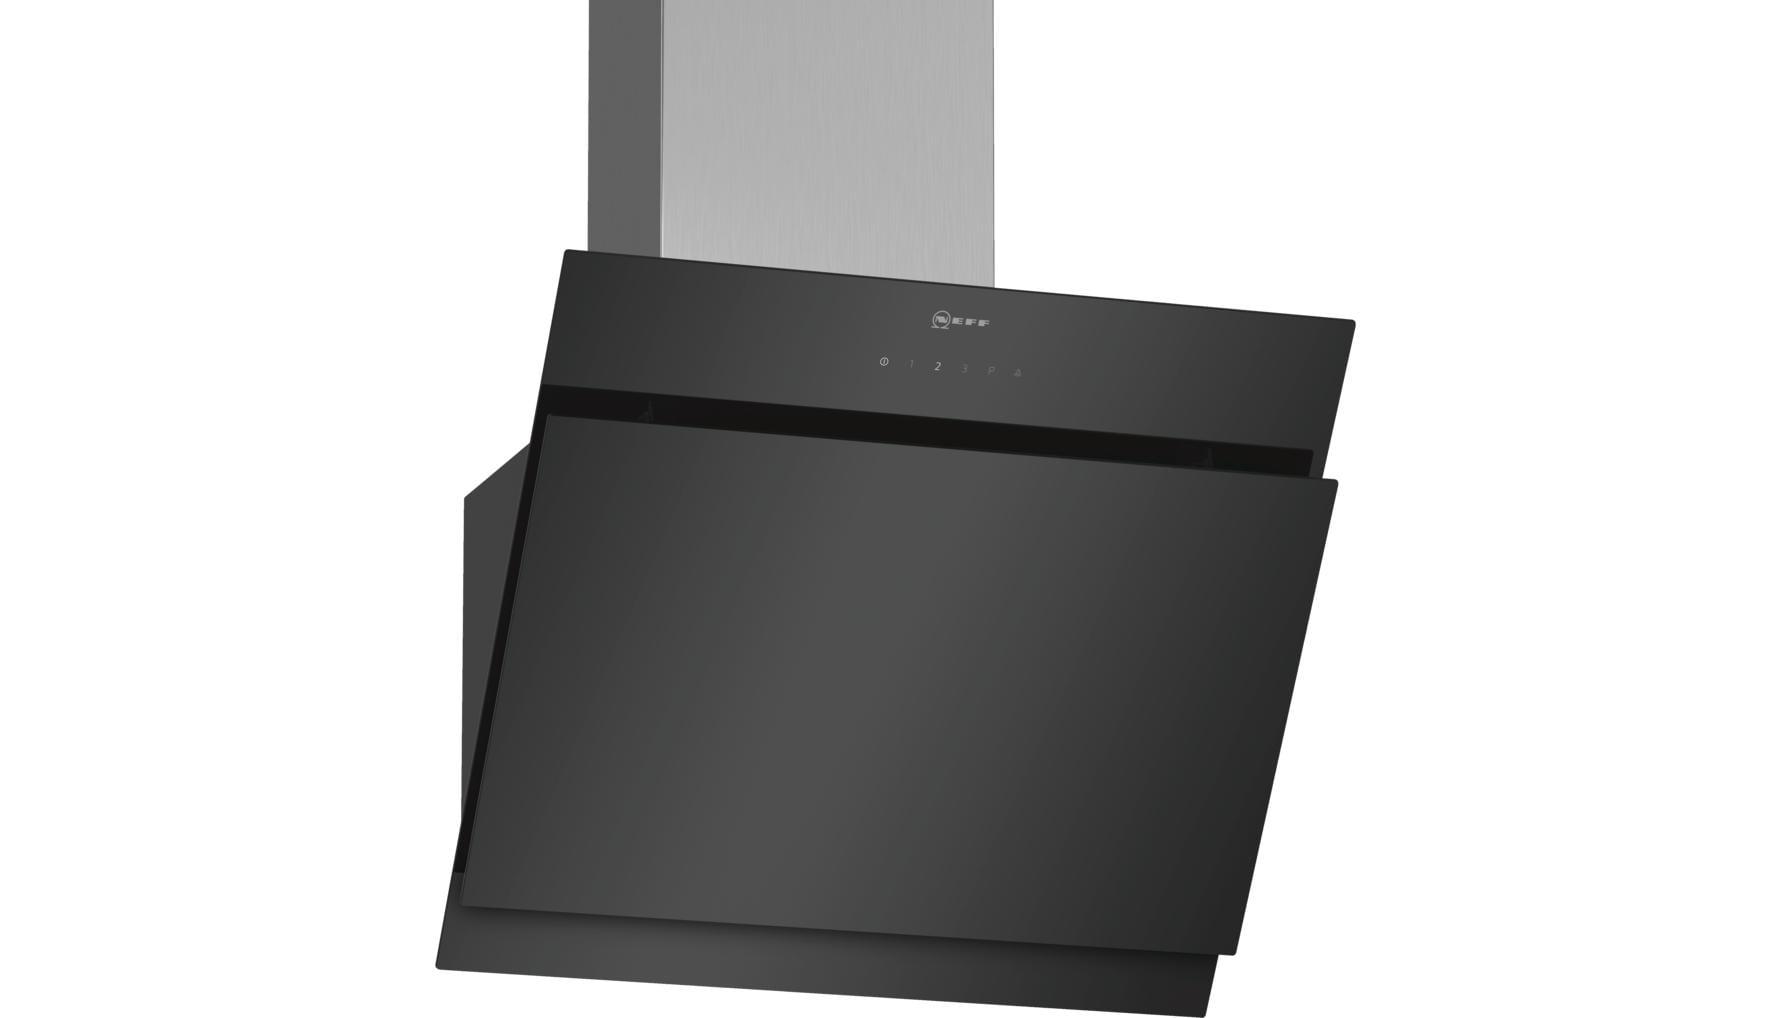 neff dihm651s kopffrei dunstabzugshaube d65ihm1s0 59 cm breit ab umluft edelstahl eek a. Black Bedroom Furniture Sets. Home Design Ideas